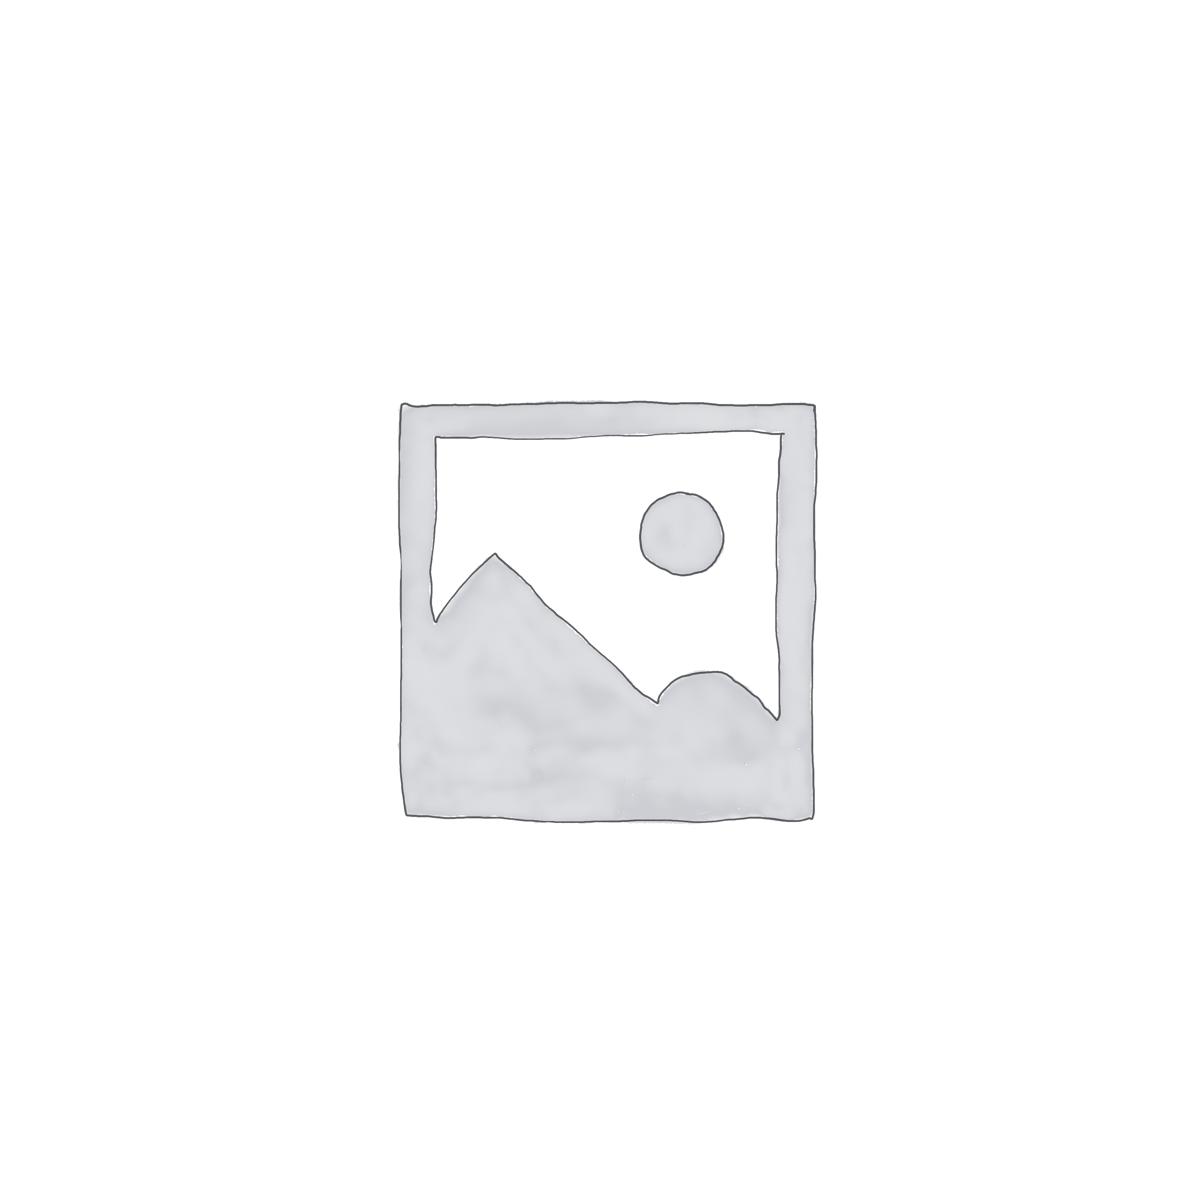 FINGER PRINT & PUNCH CARD MACHINE